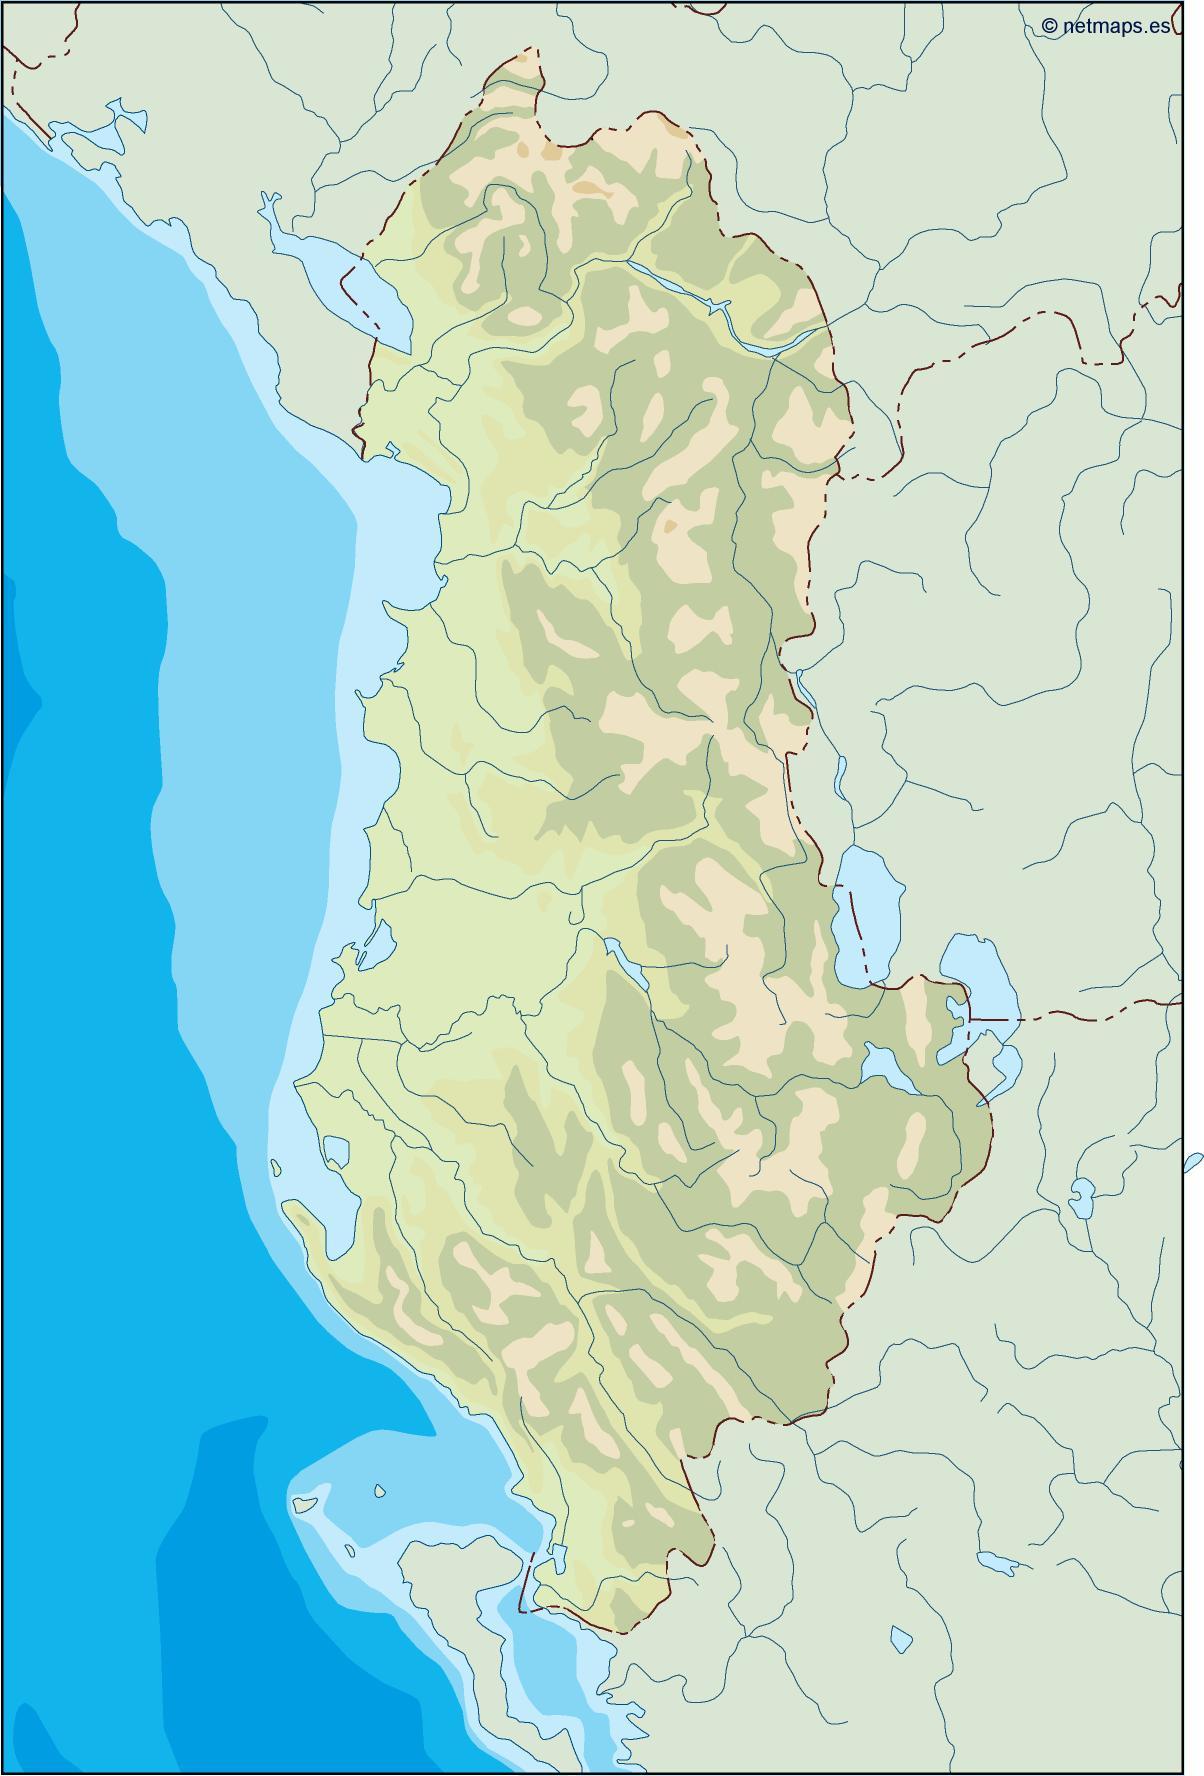 albania illustrator map